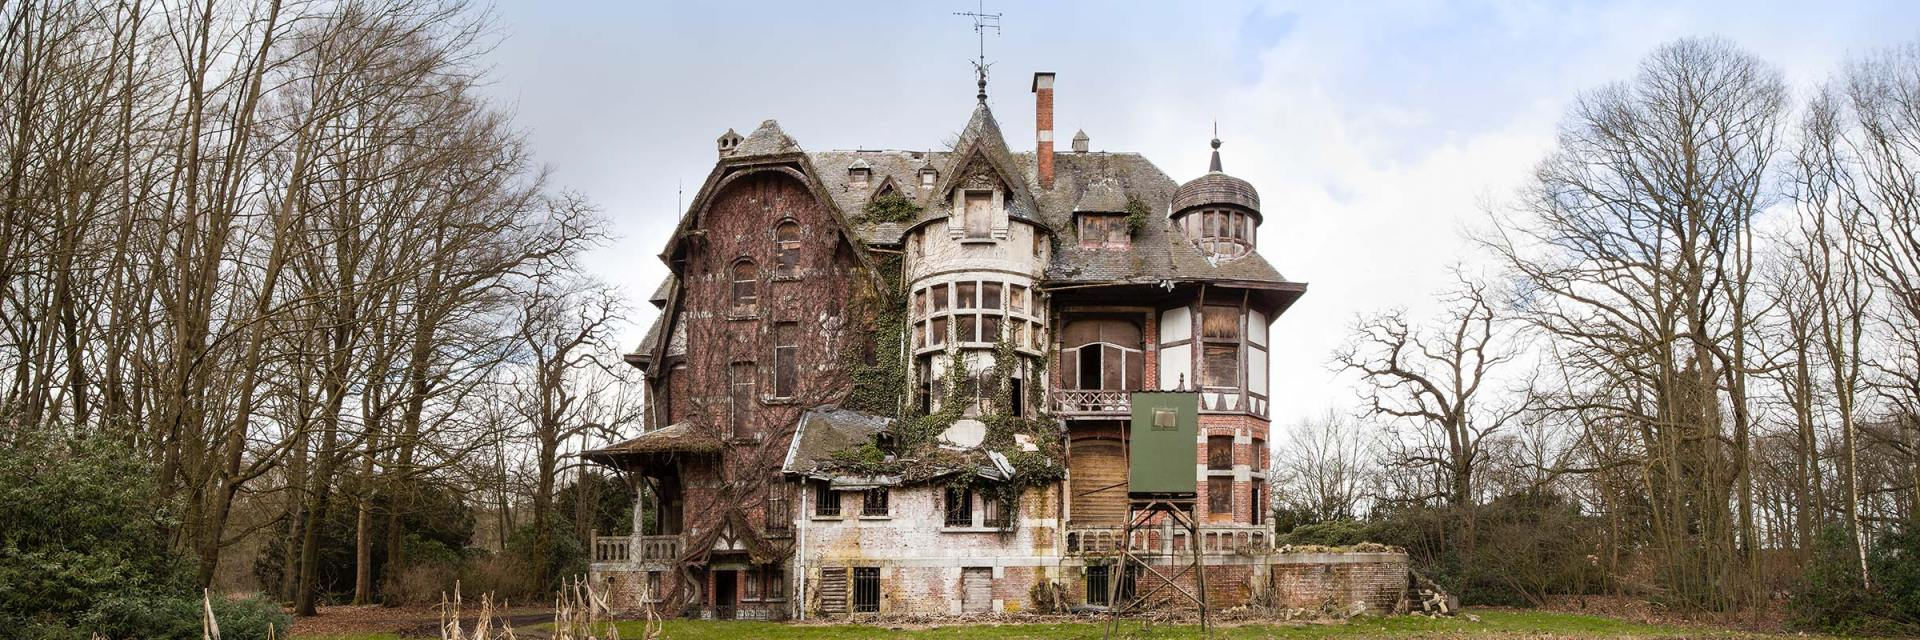 Chateau Nottebohm, urbex, verlaten kasteel